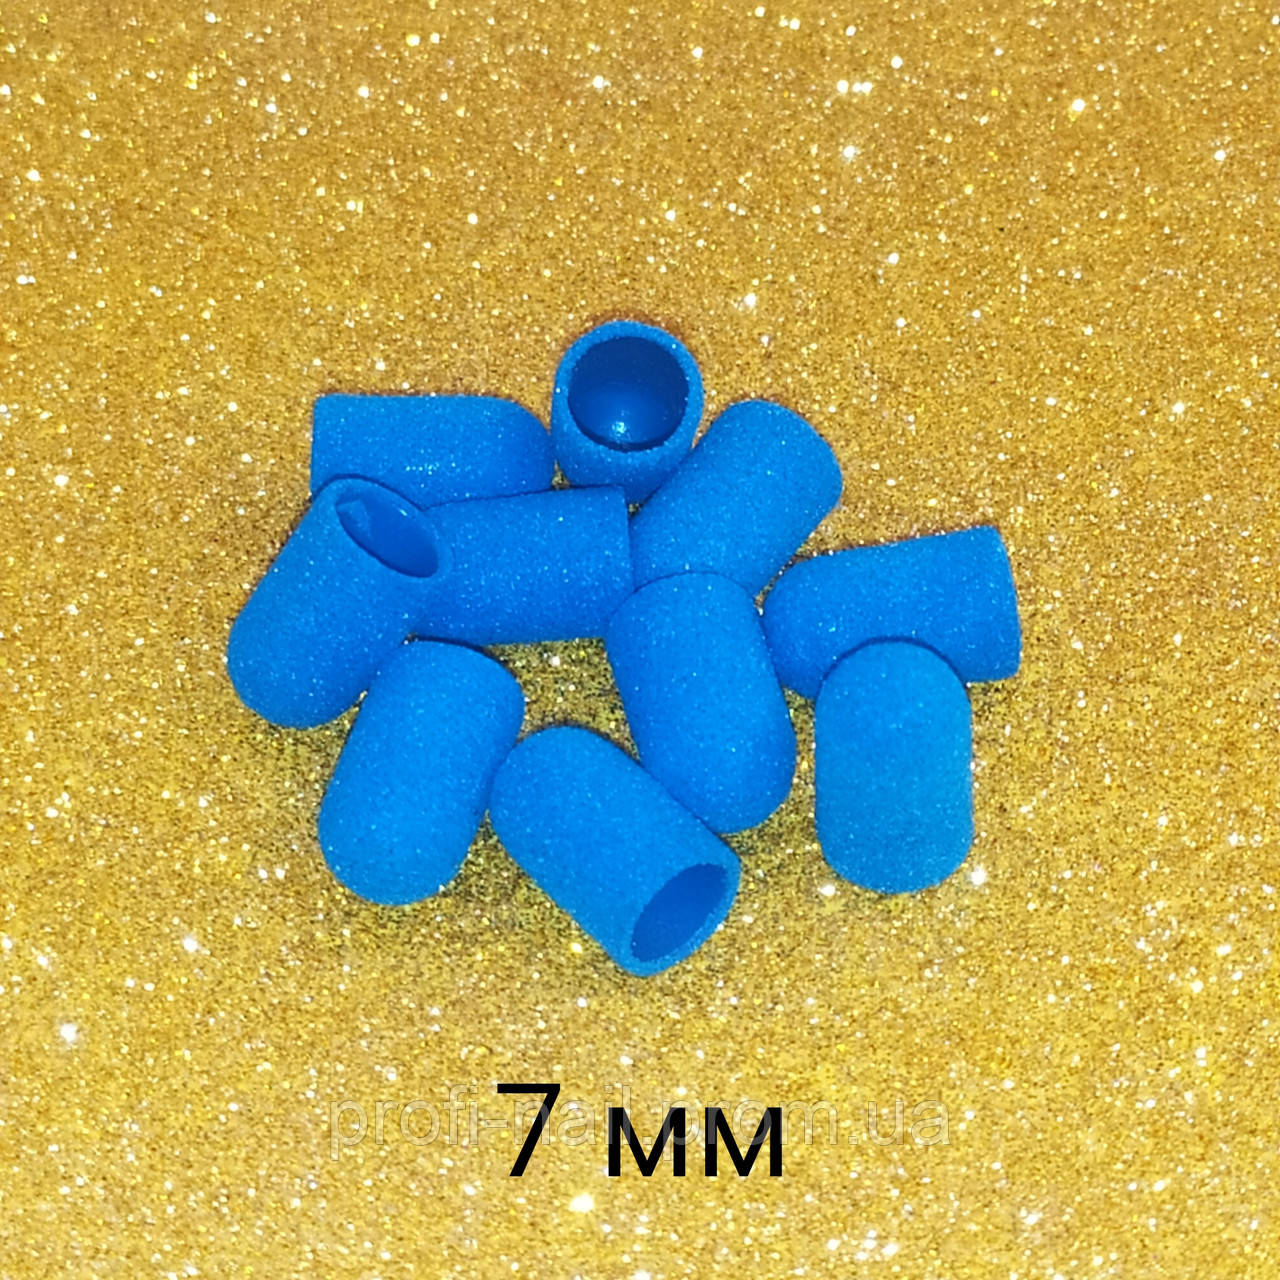 Колпачки голубые, диаметр 7мм 160грит 10шт. Panorama